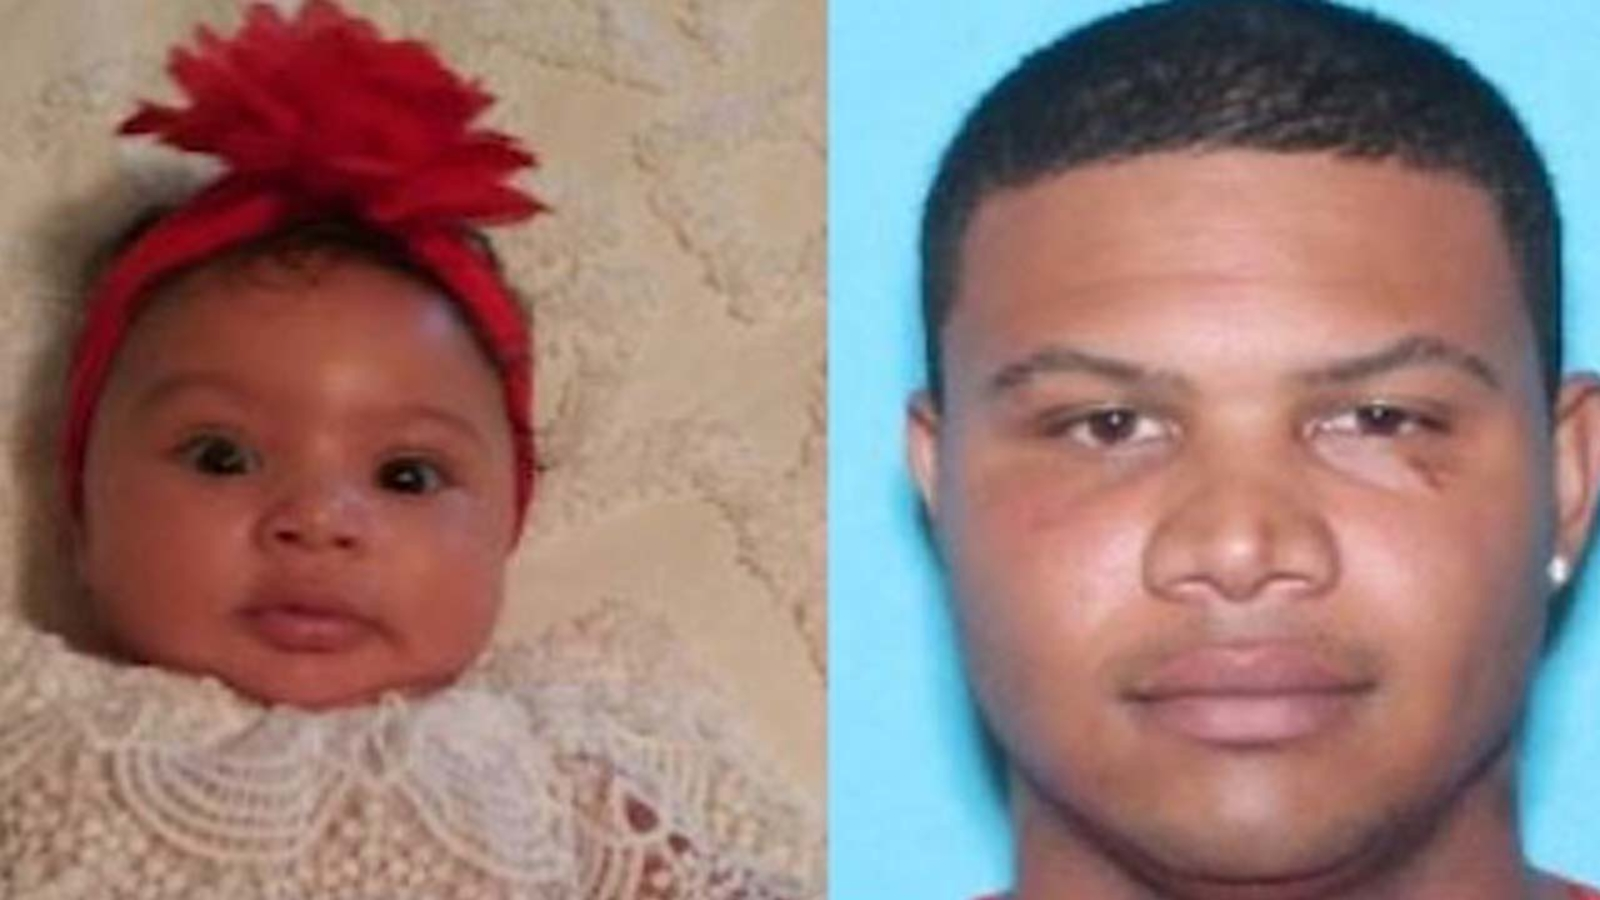 Amber Alert Texas 3 Month Old Lyrik Brown From Gainesville Texas Found Dead Suspect Arrested Abc13 Houston